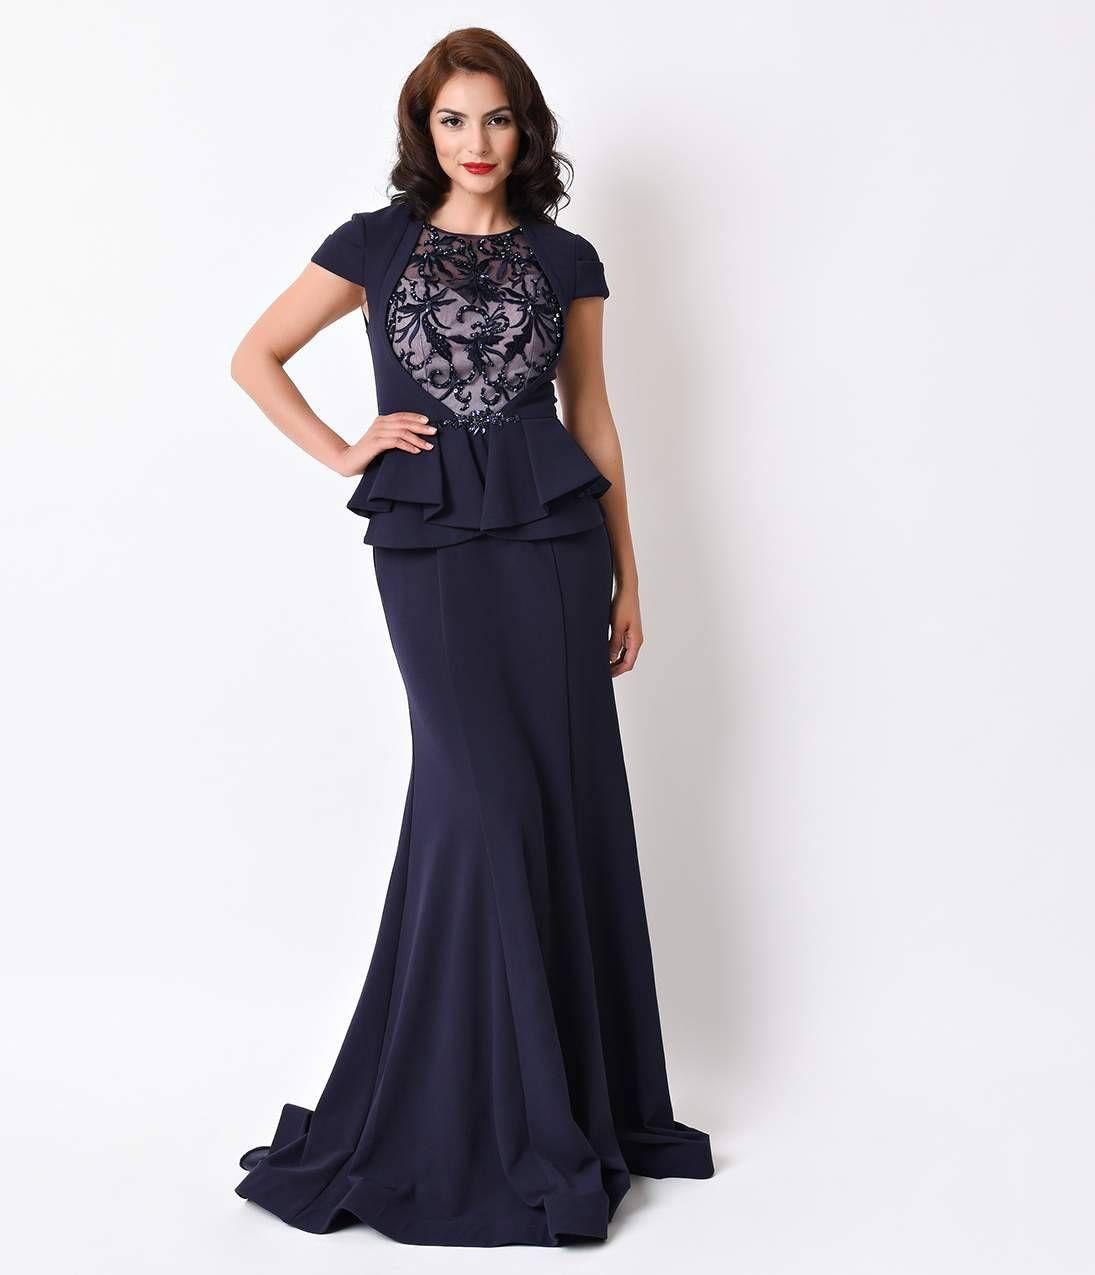 prettiest vintageinspired prom dresses vintage prom s style